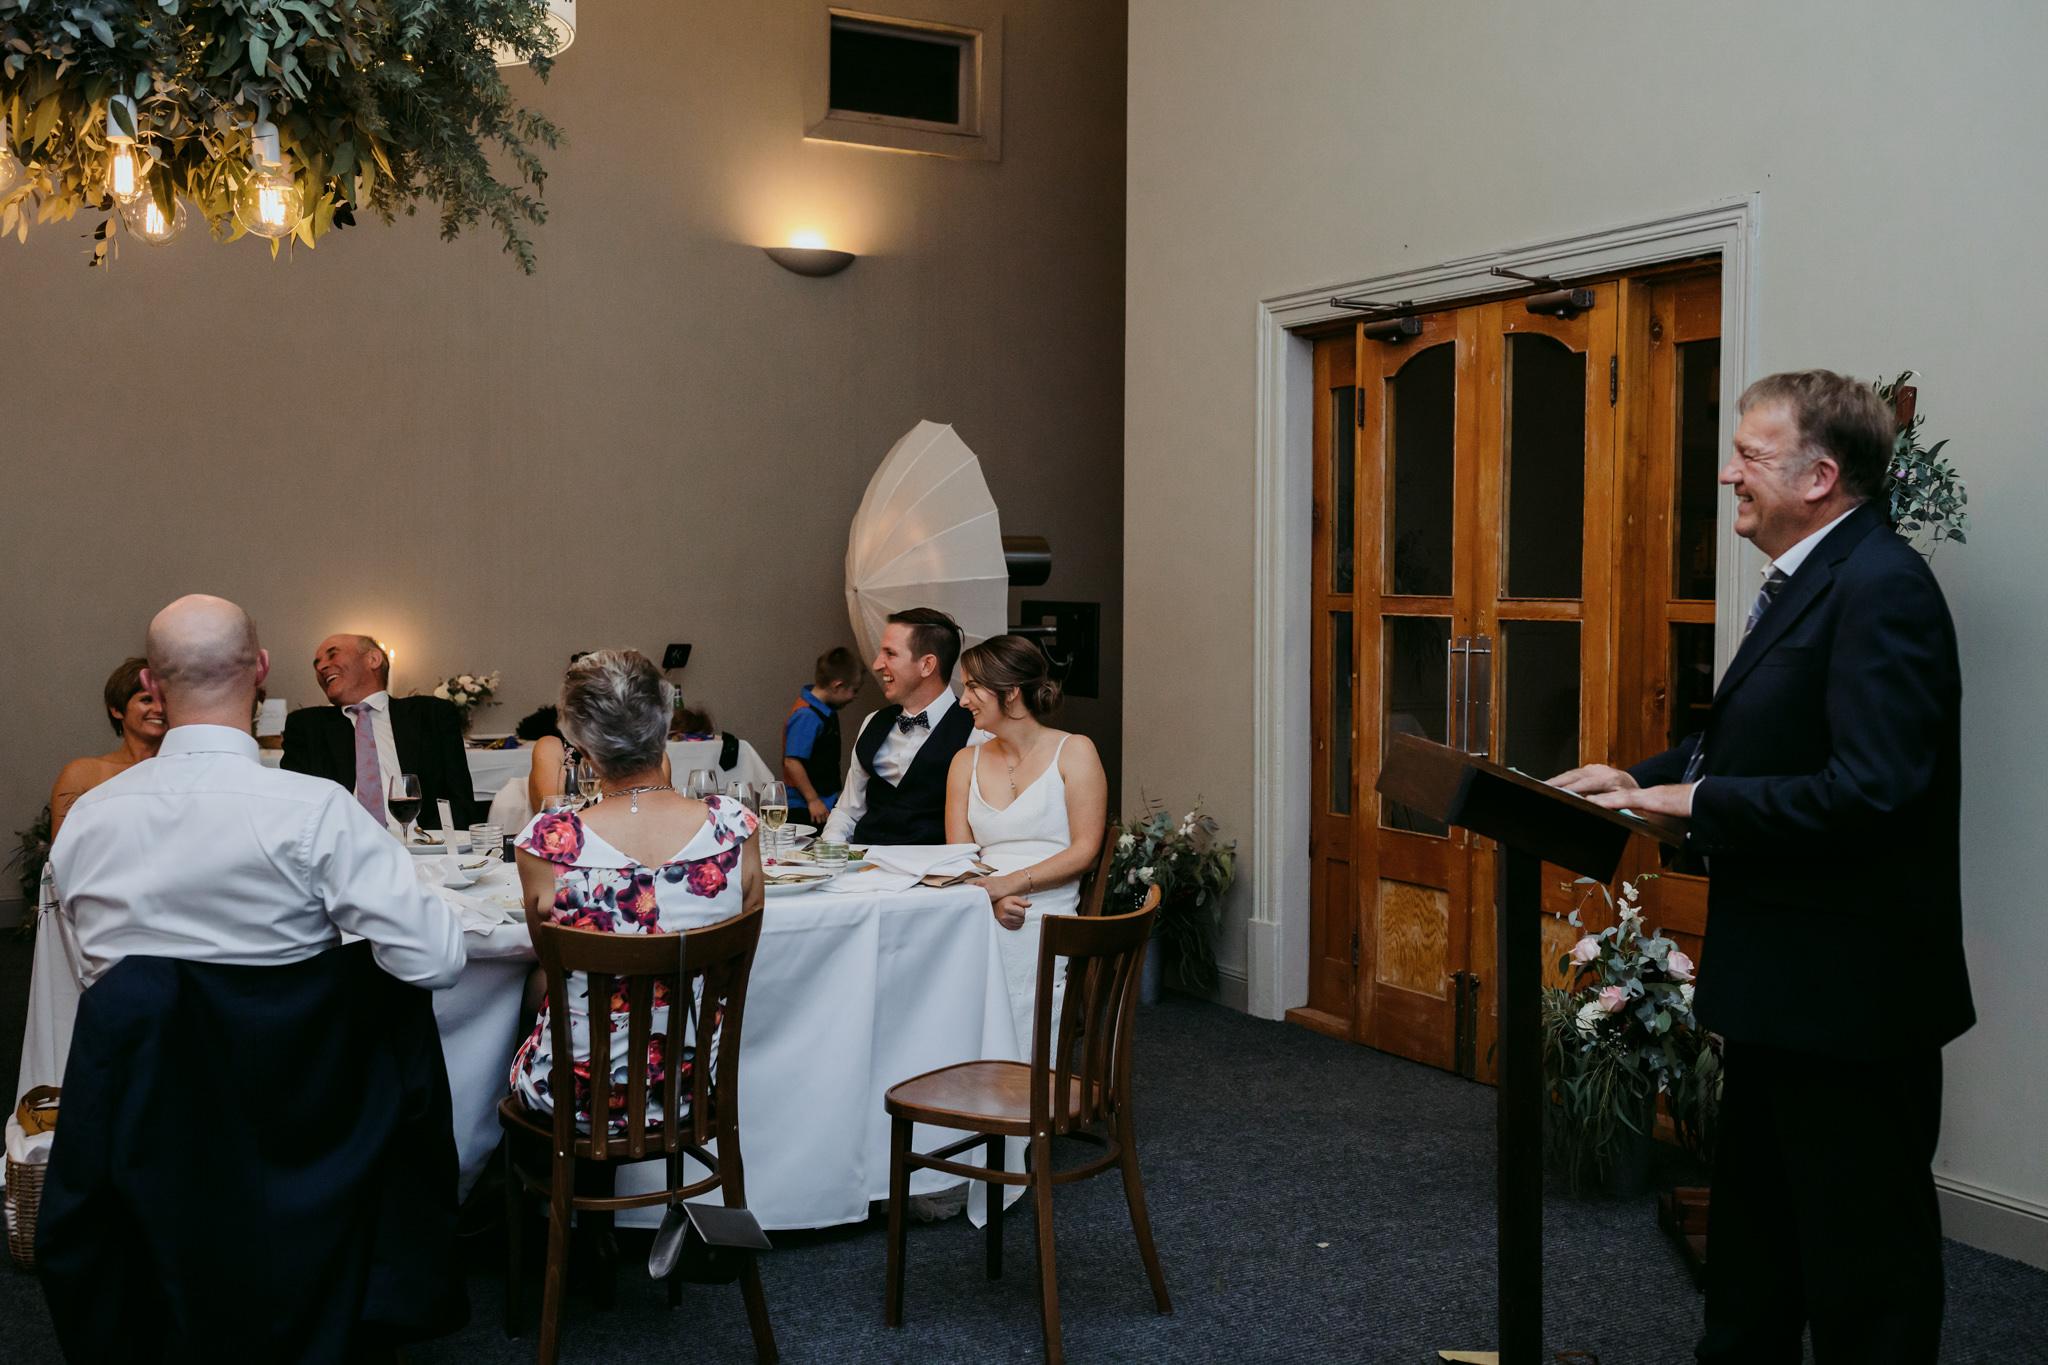 Erin Latimore Mudgee Canberra Wedding Photographer ROSEBANK GUESTHOUSE OLD THEATRE TONIC MILLTHORPE_741.JPG